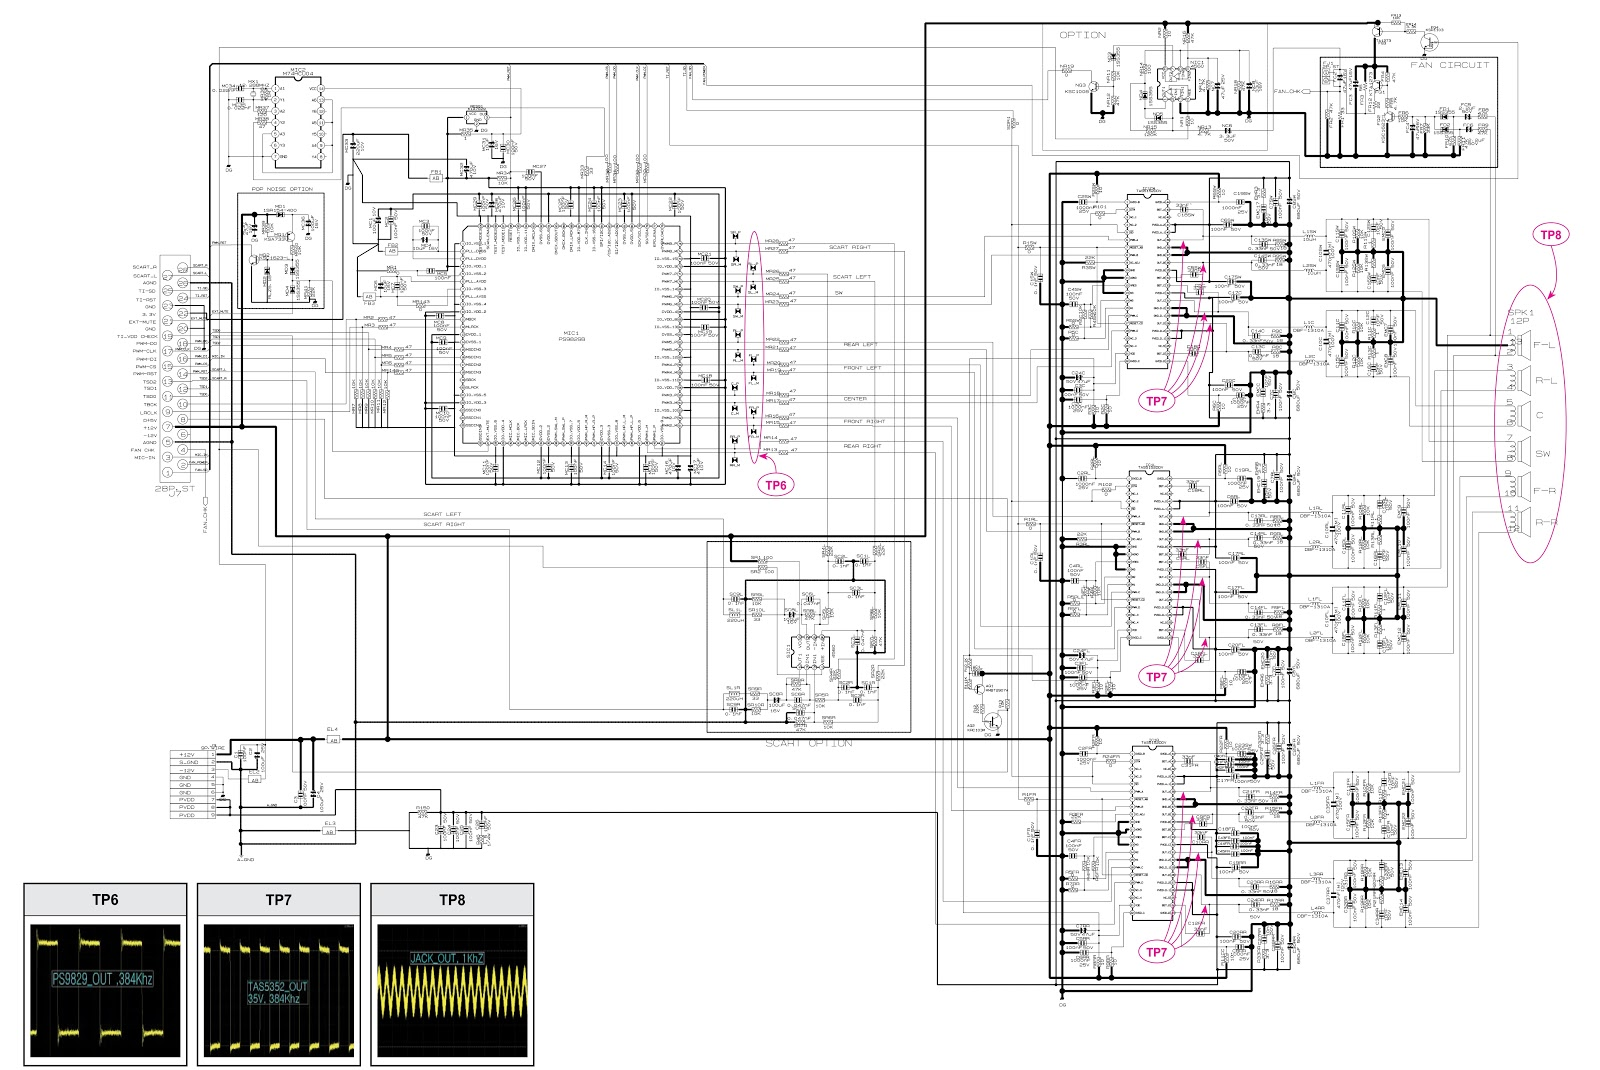 Electro help: Samsung HTZ210